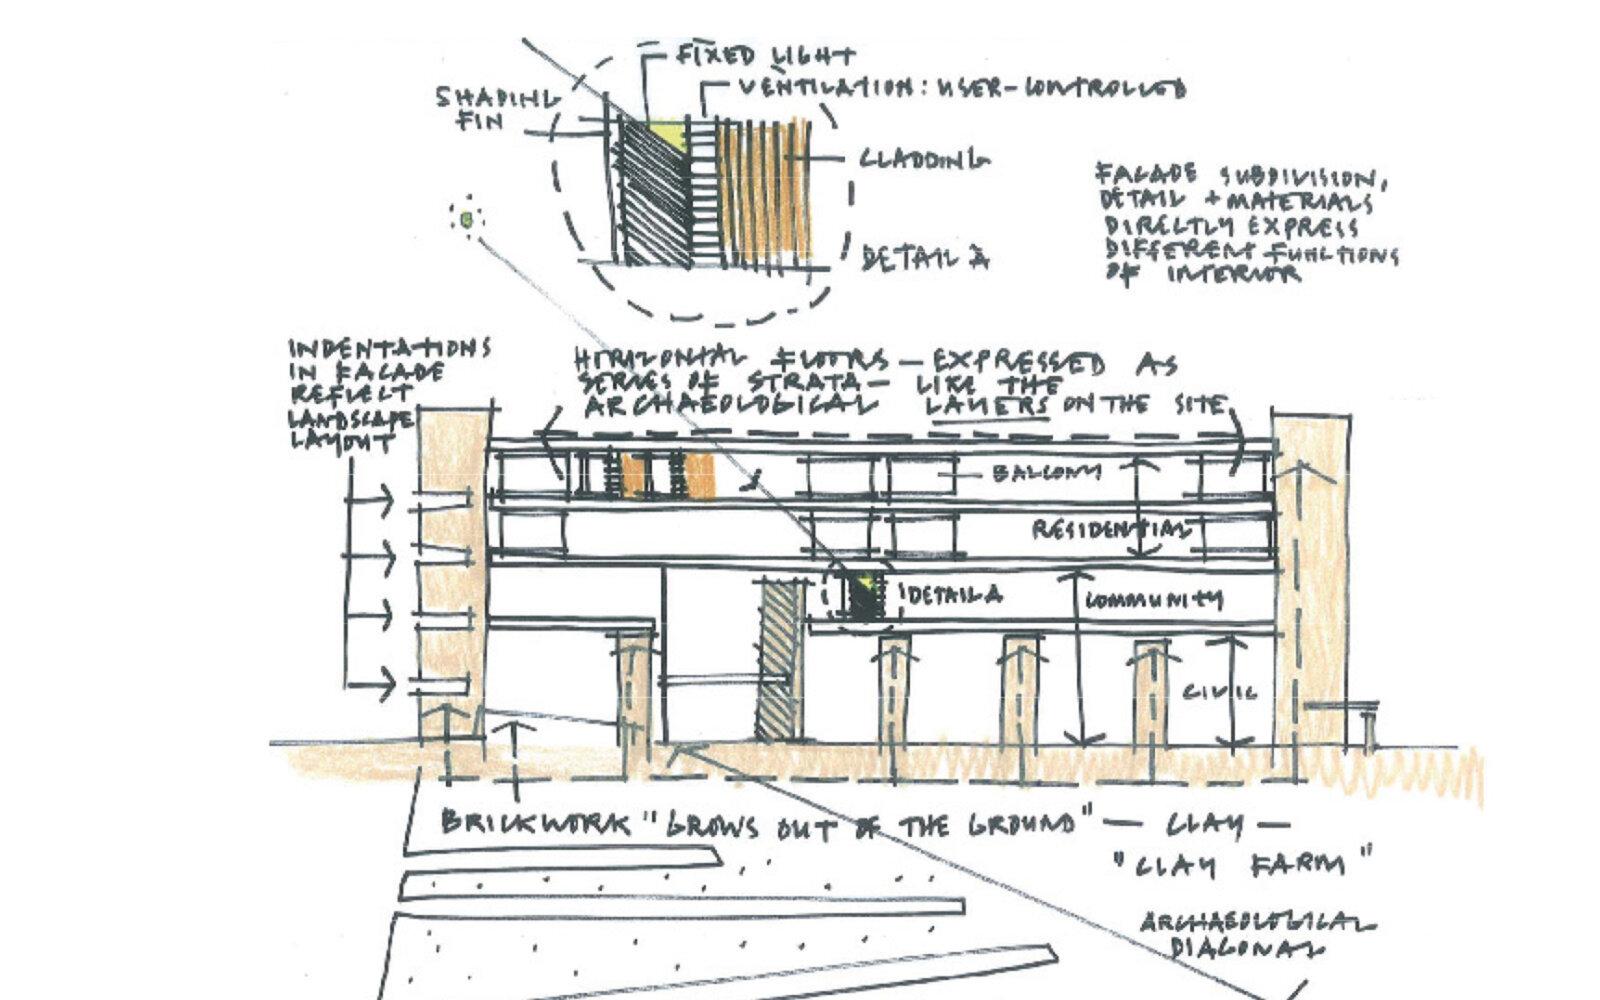 Clay Farm Community Centre elevation sketch